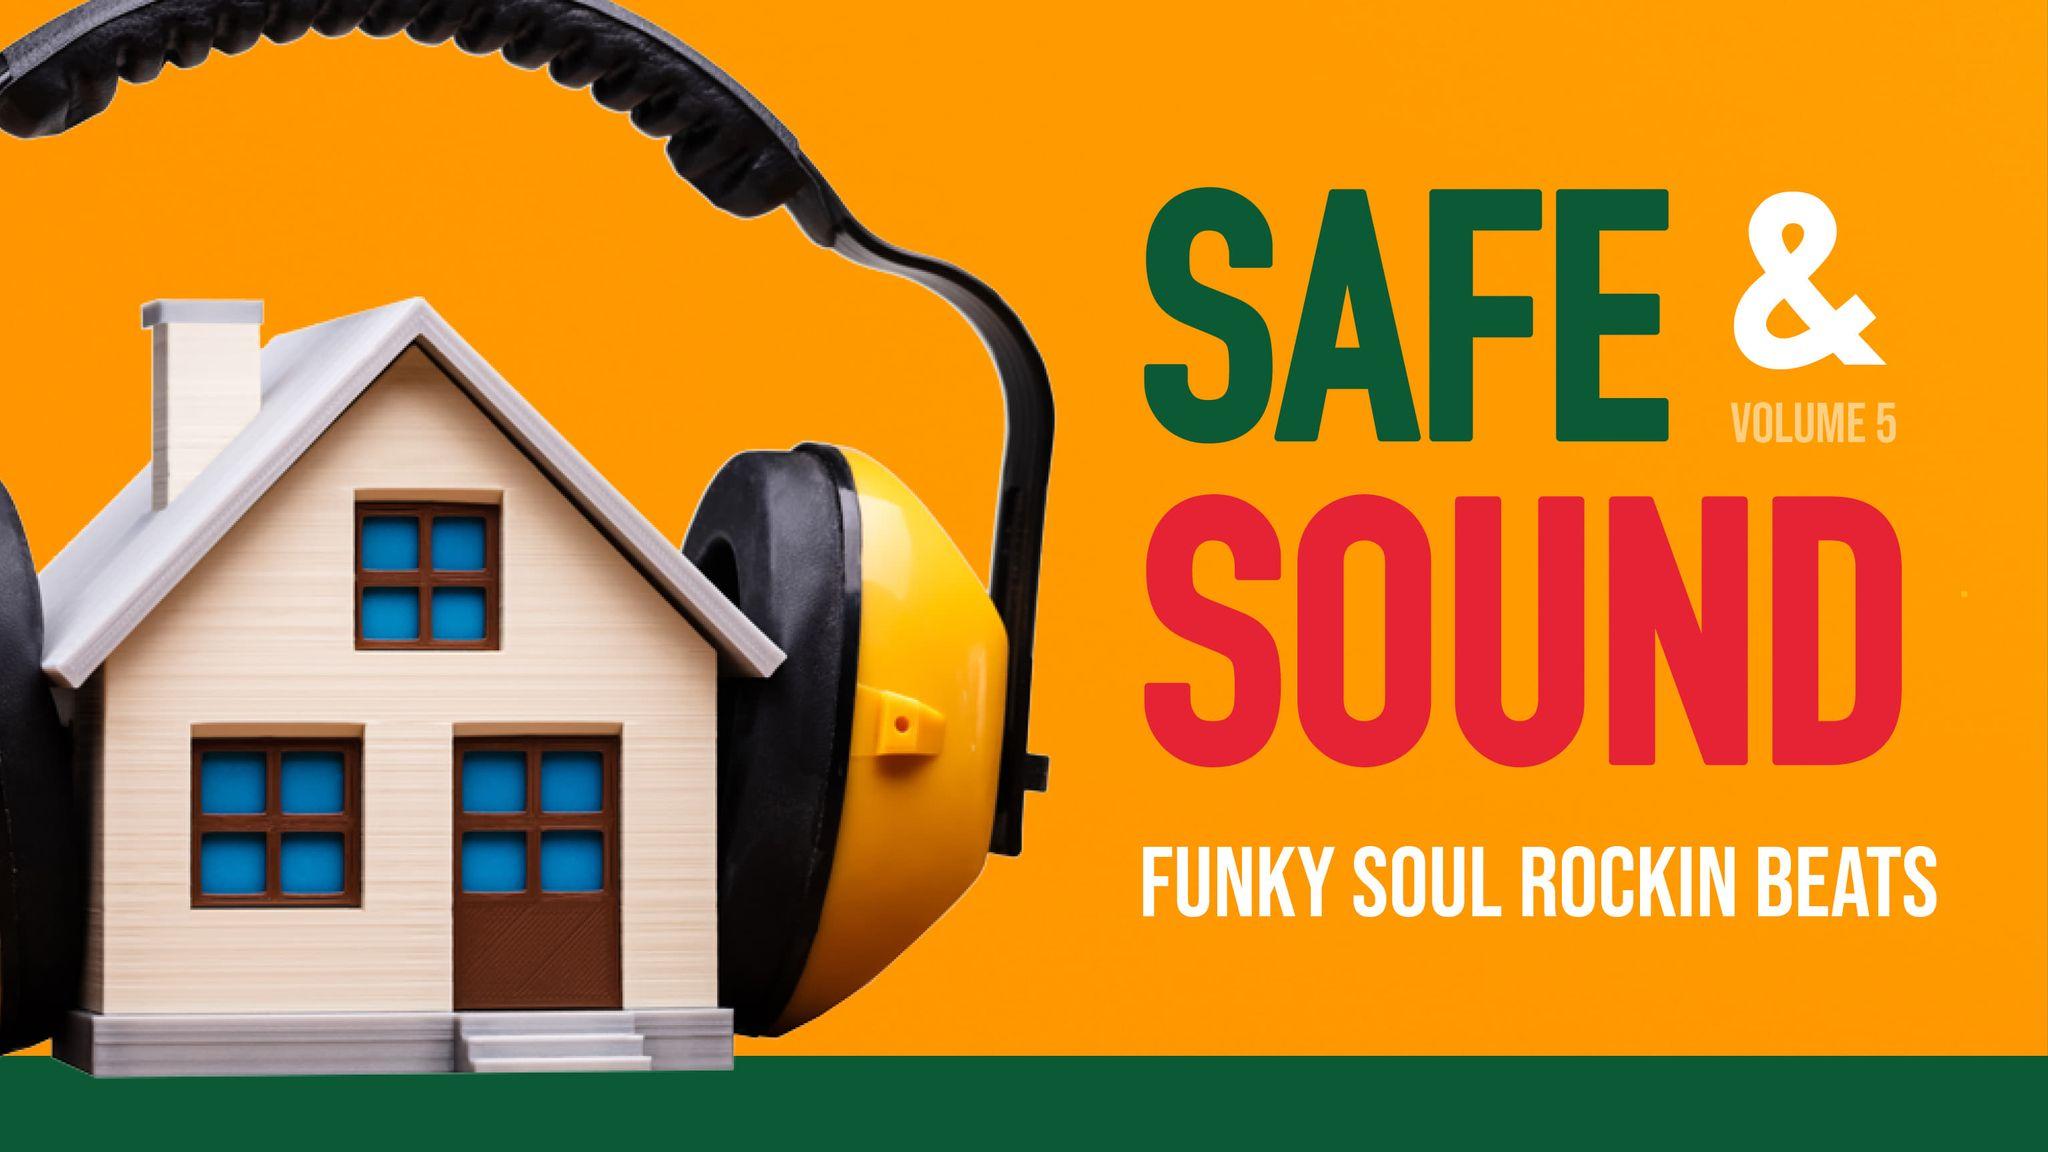 Homegrown Djs: Safe & Sound (Vol 5) - January 30th 2021